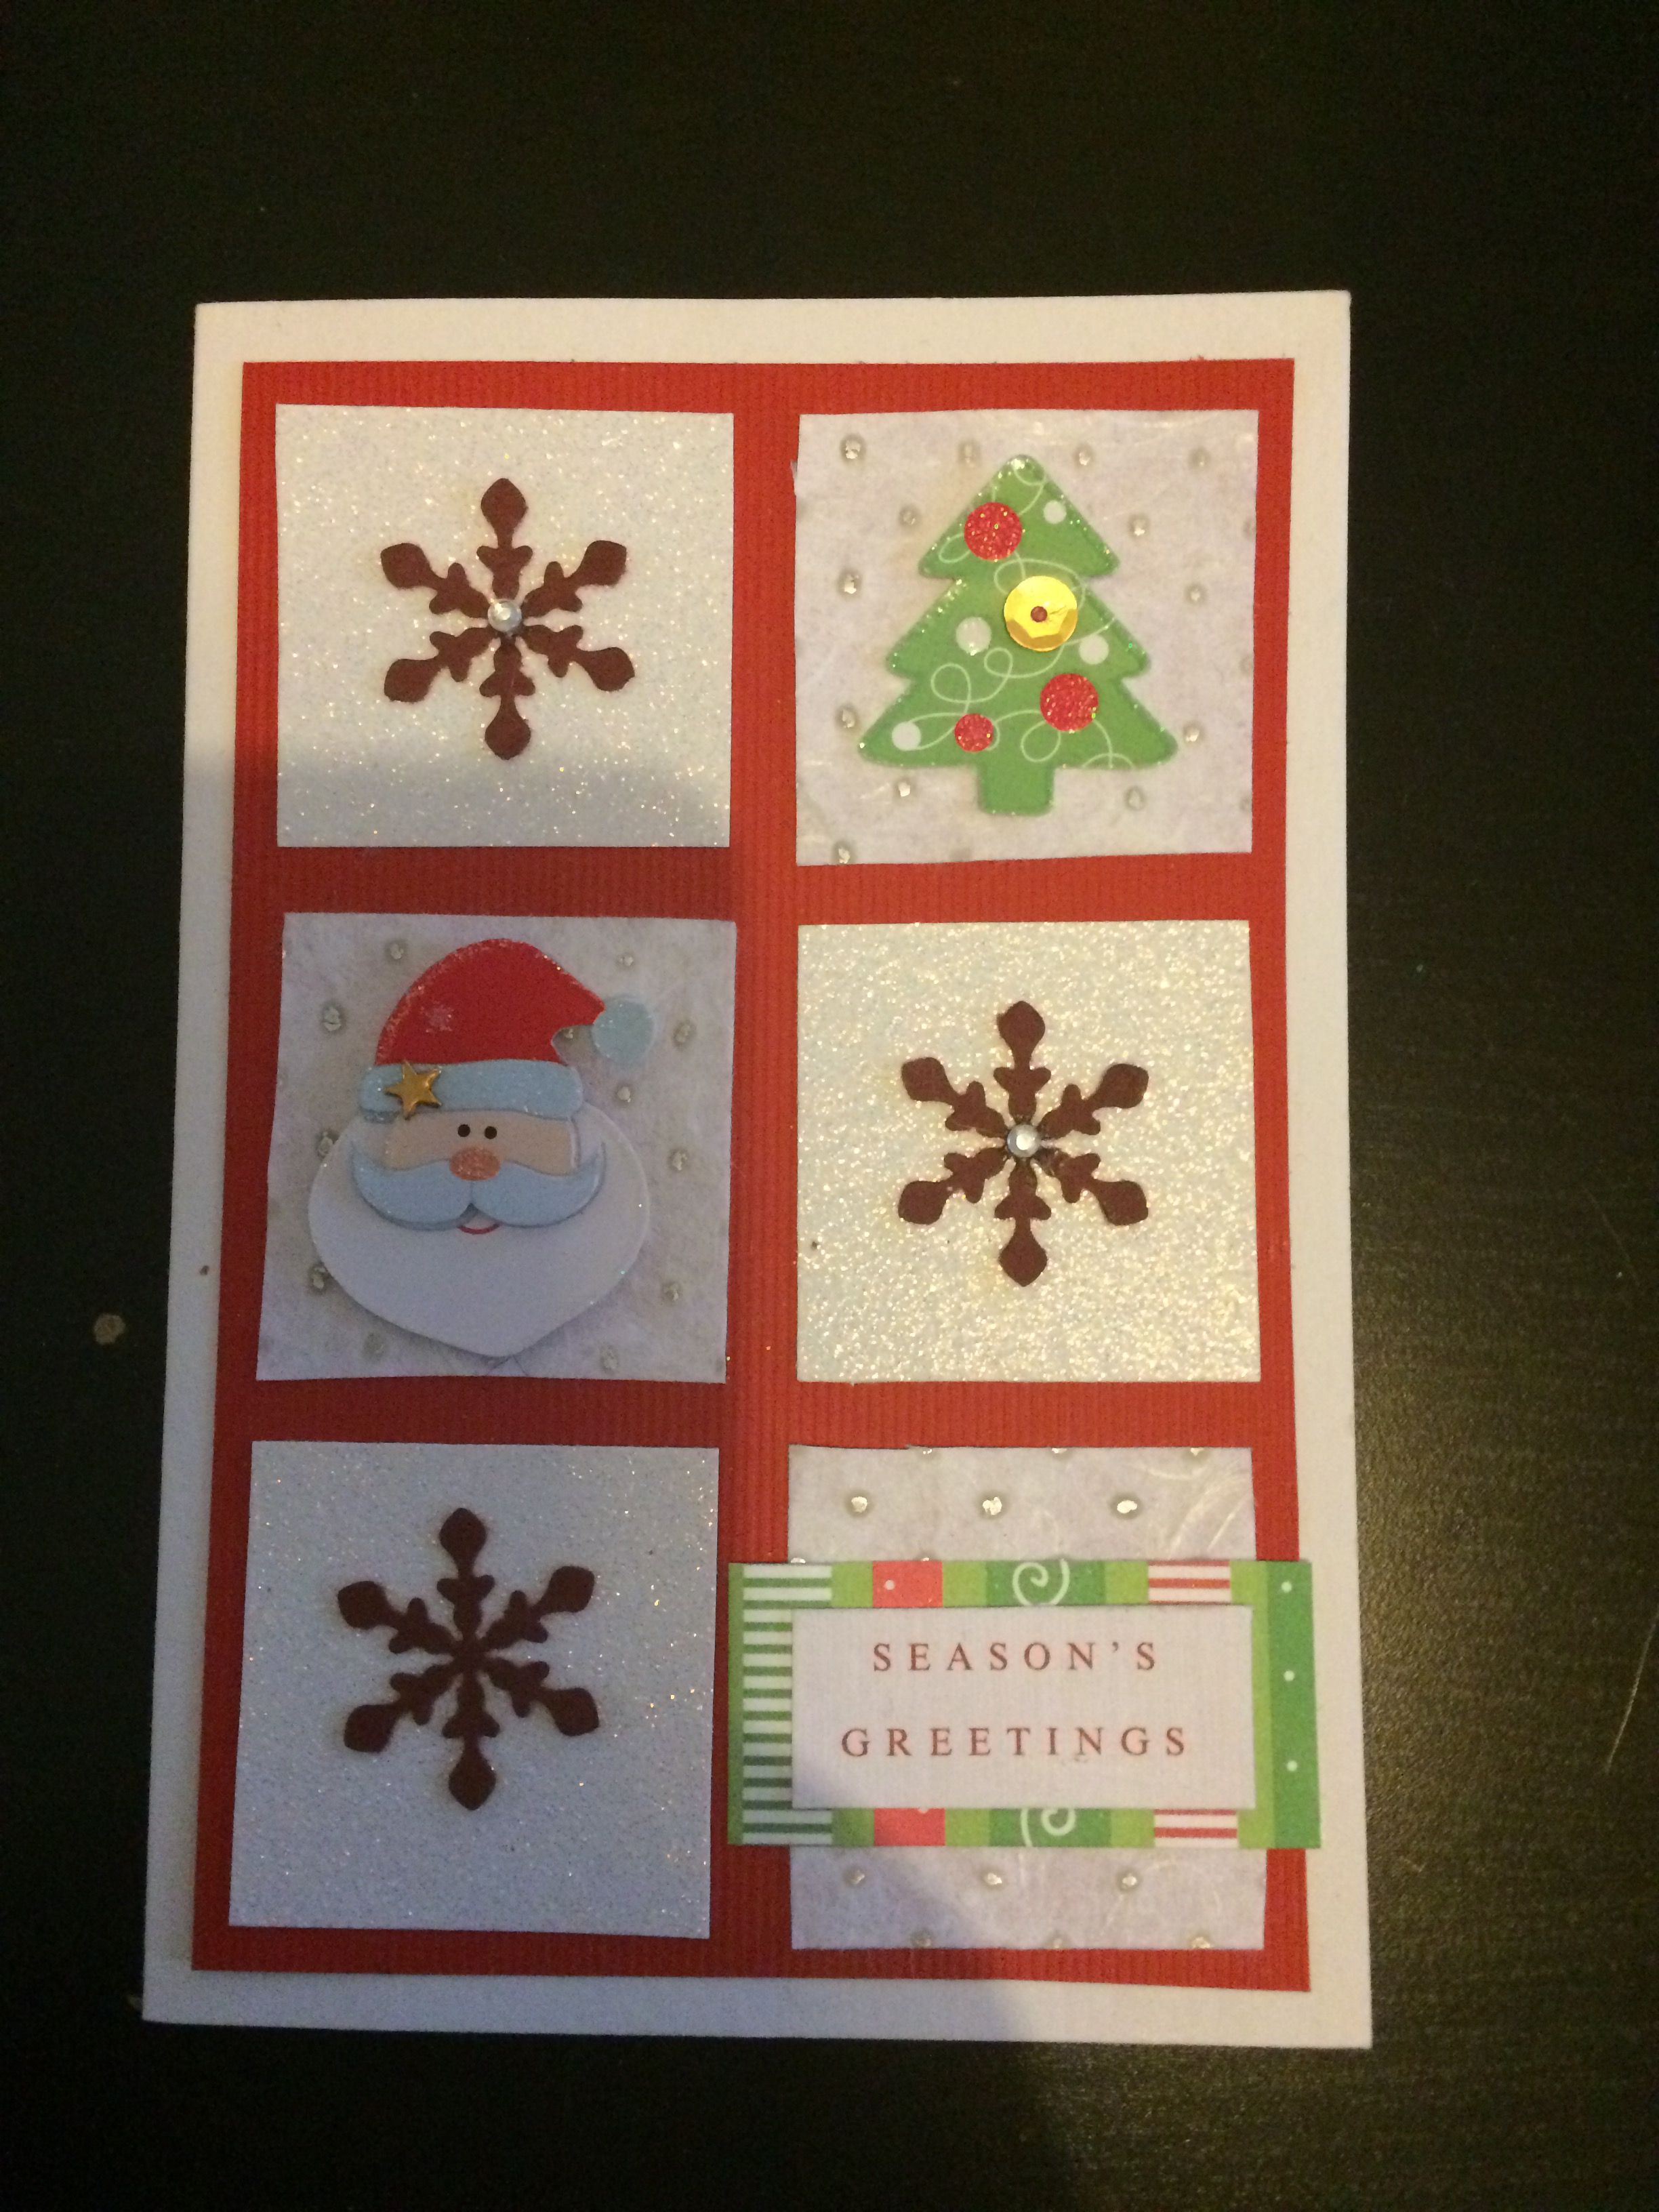 Handmade Christmas Cards.  #handmade #handmadecrafts #handmadechristmascards #artsandcrafts #crafts #christmascards